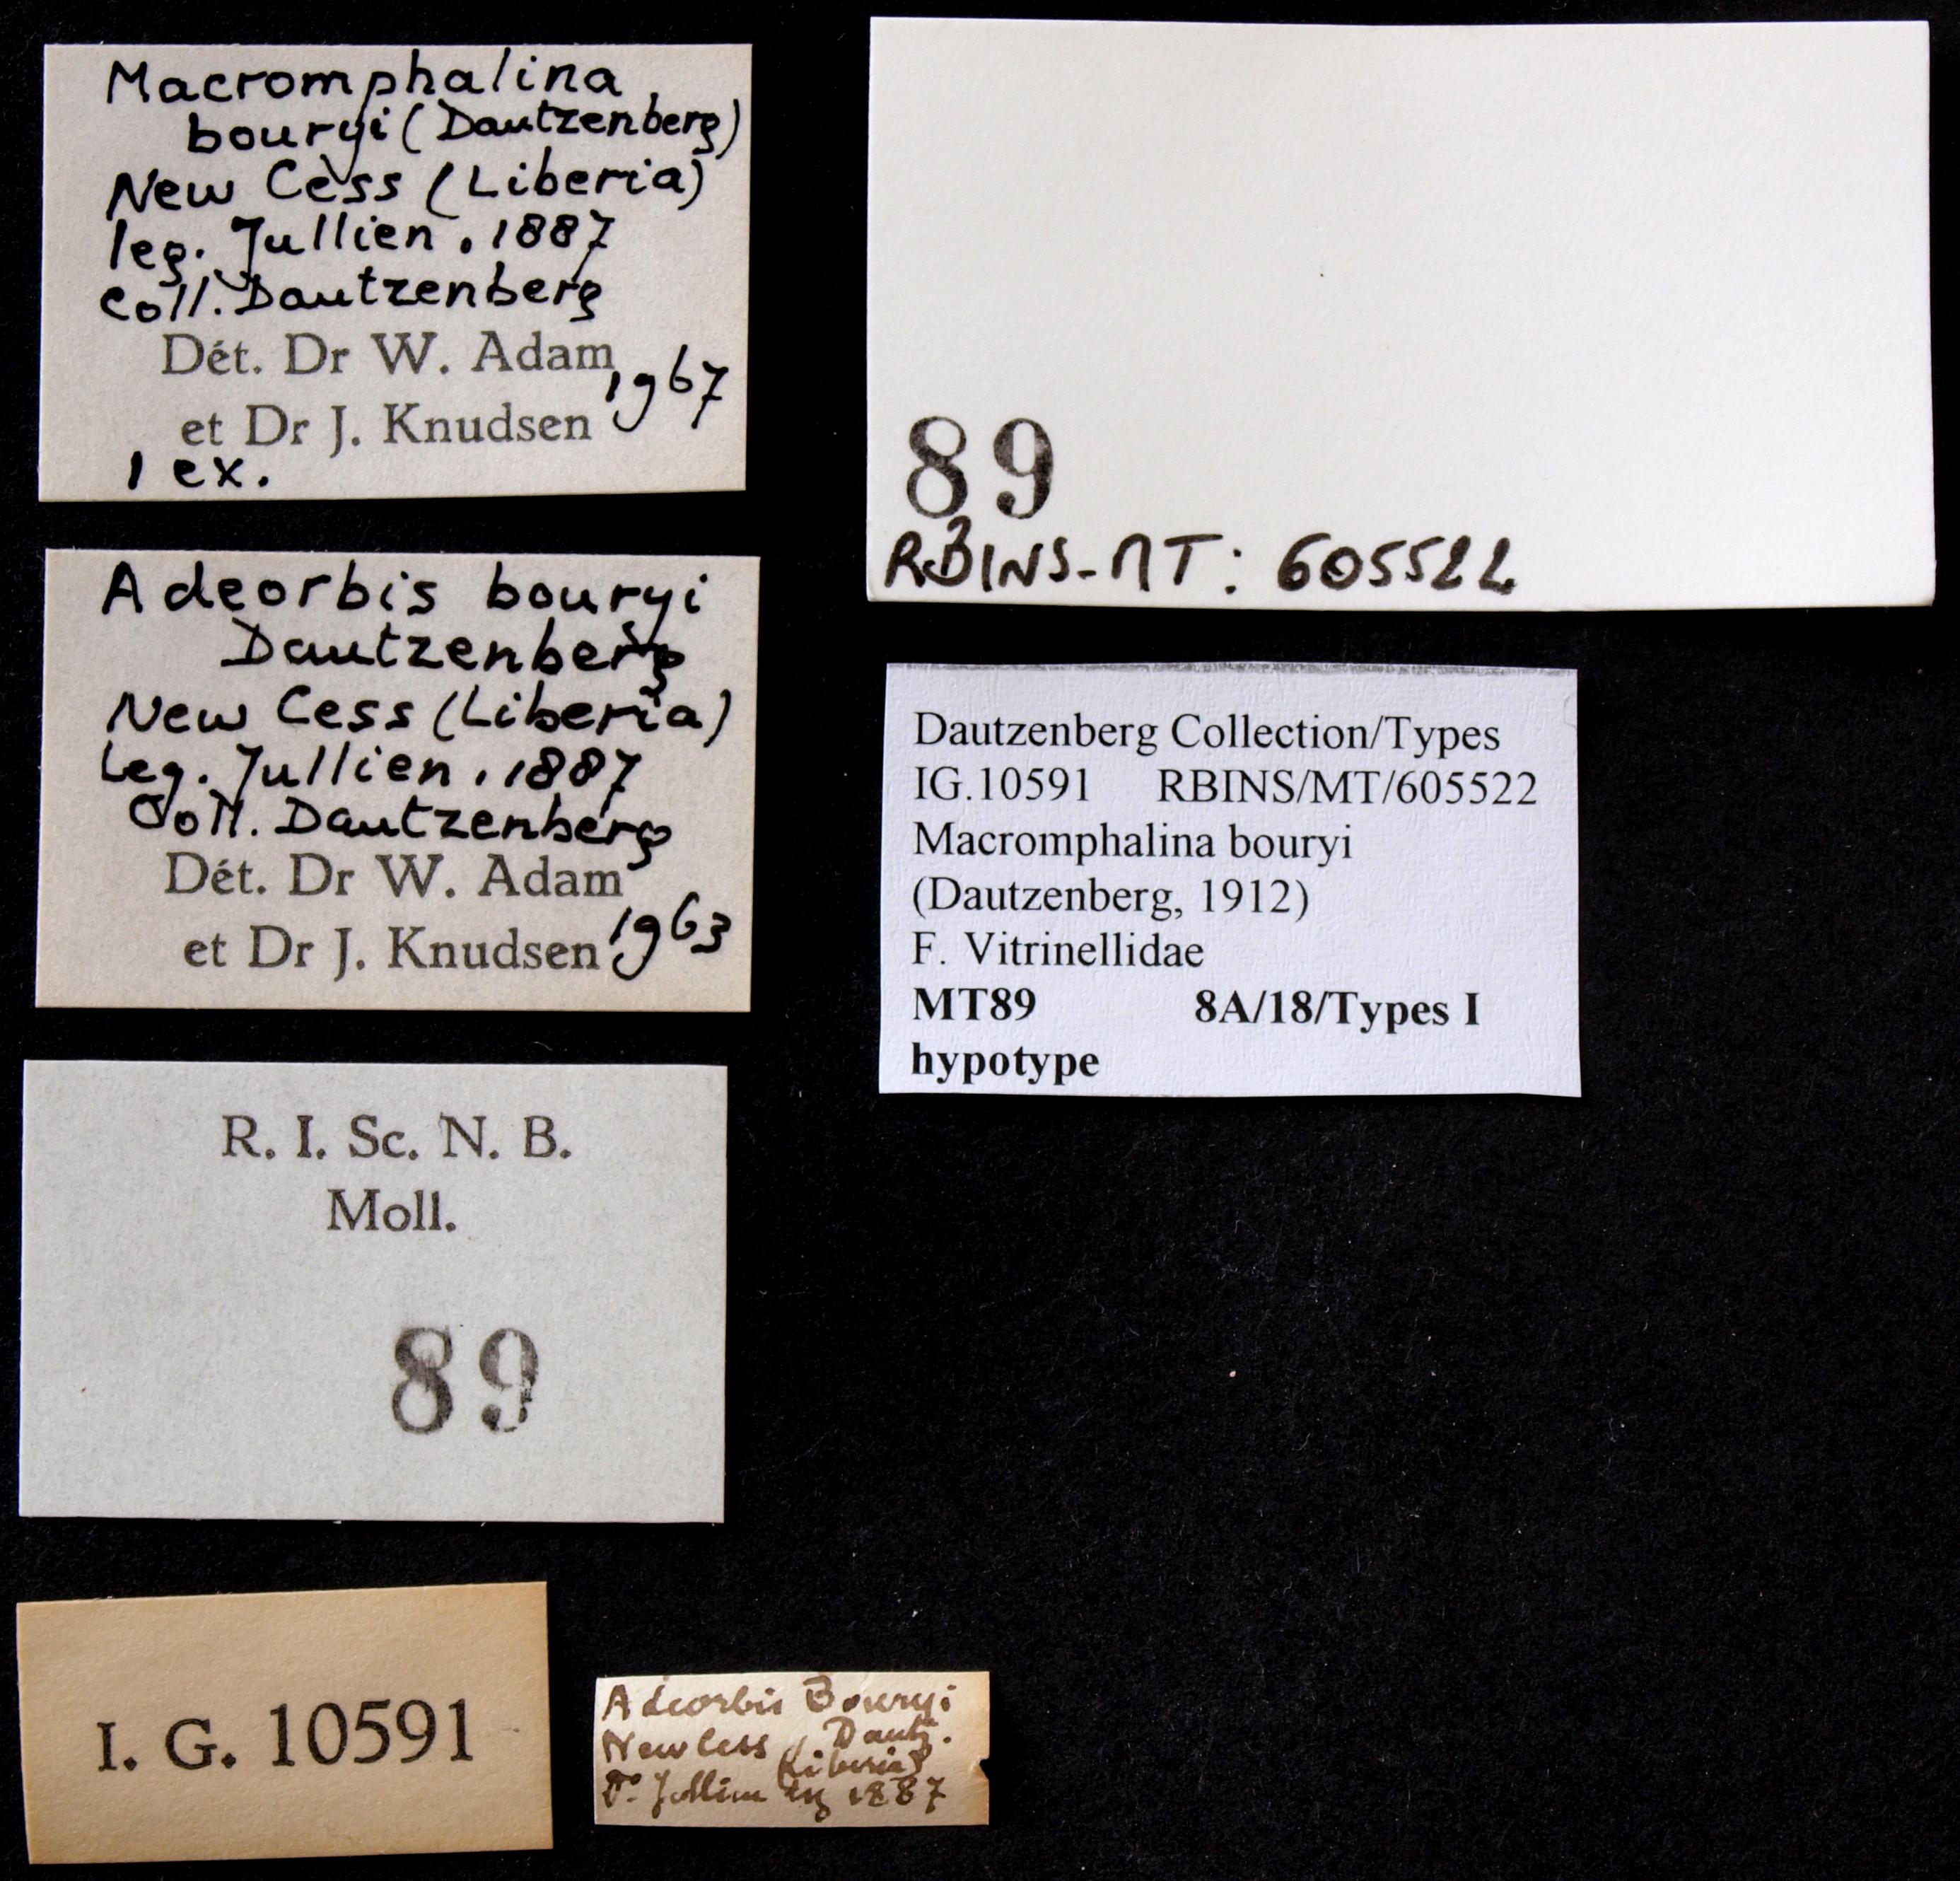 0089 Macromphalina bouryi Hyp Lb.JPG